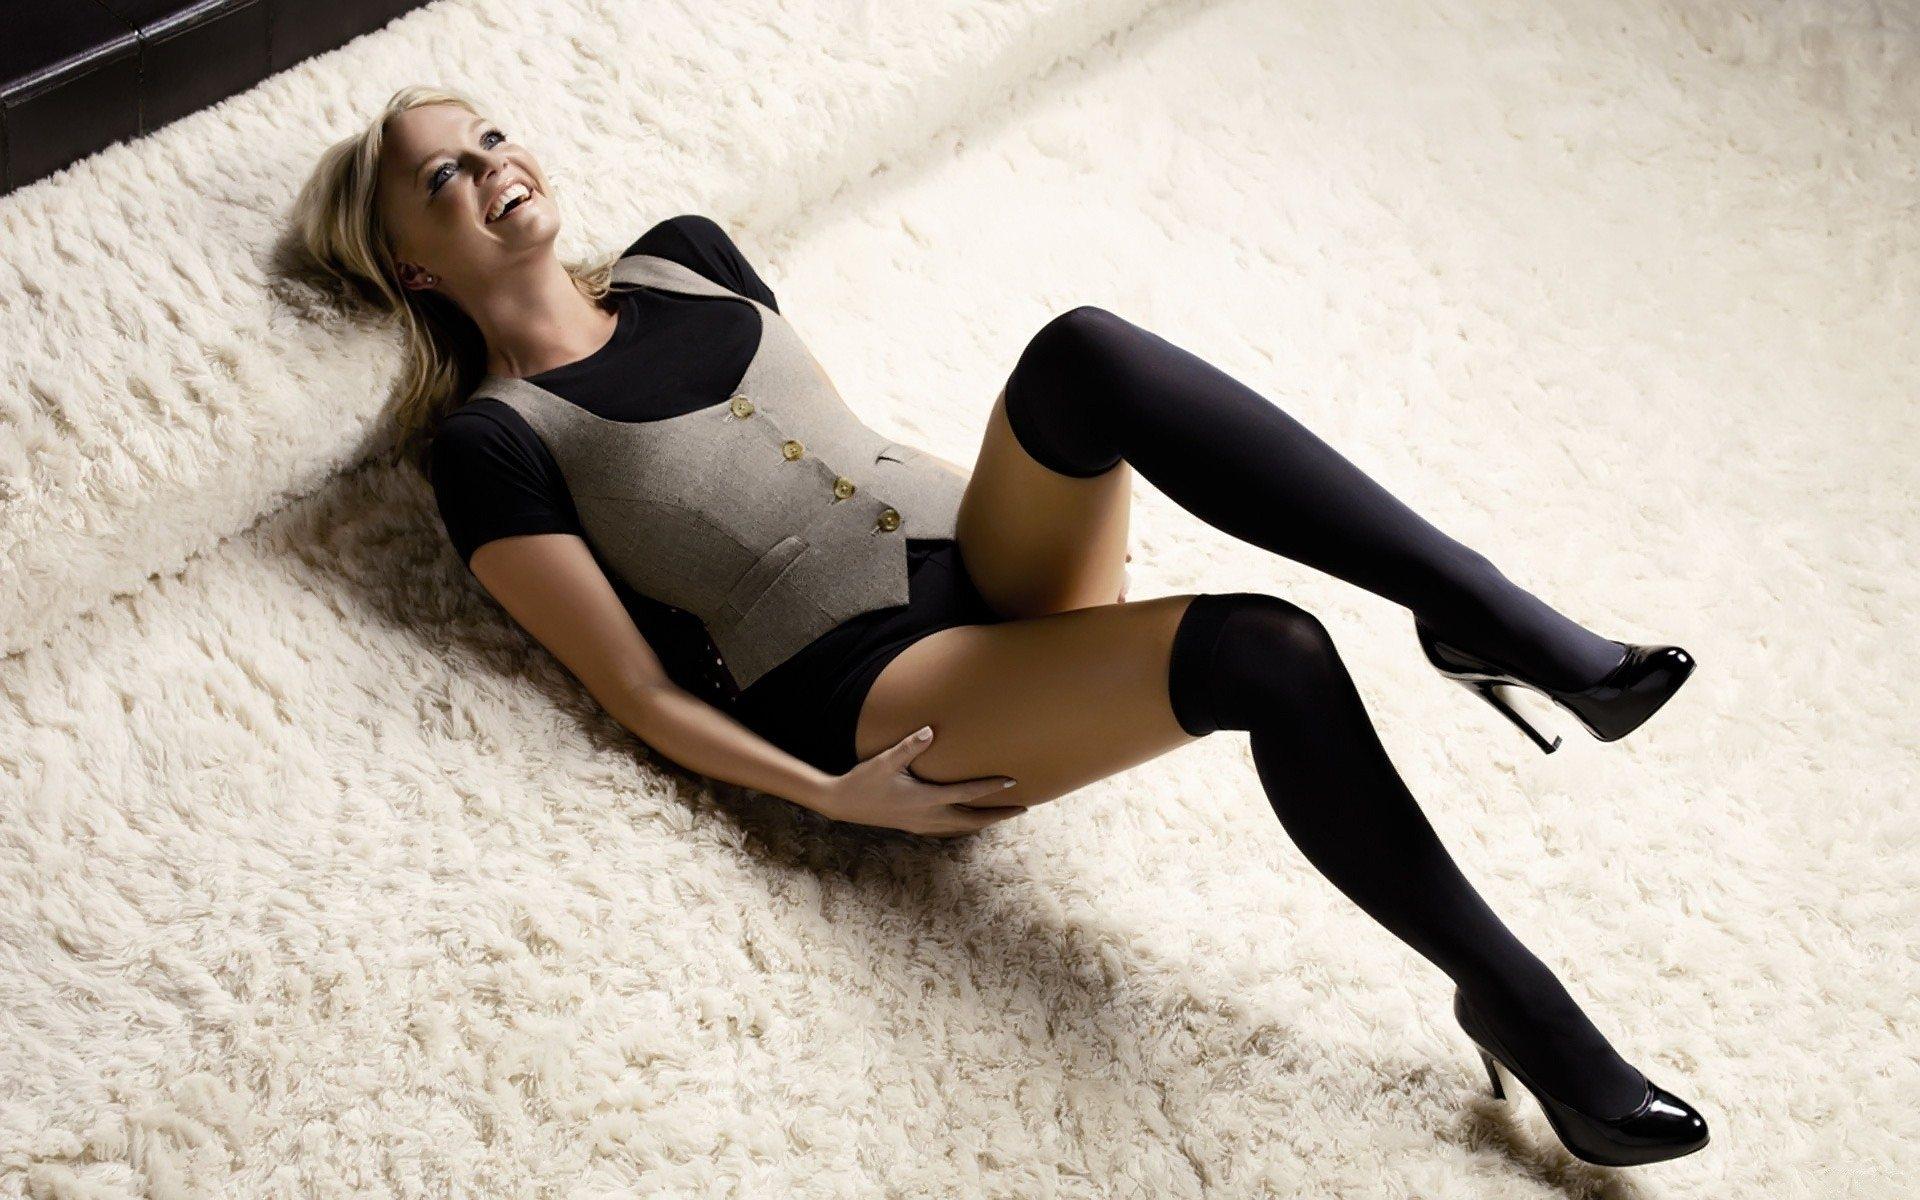 1920x1200 Wallpaper emma bunton carpet shoes girl legs 1920x1200